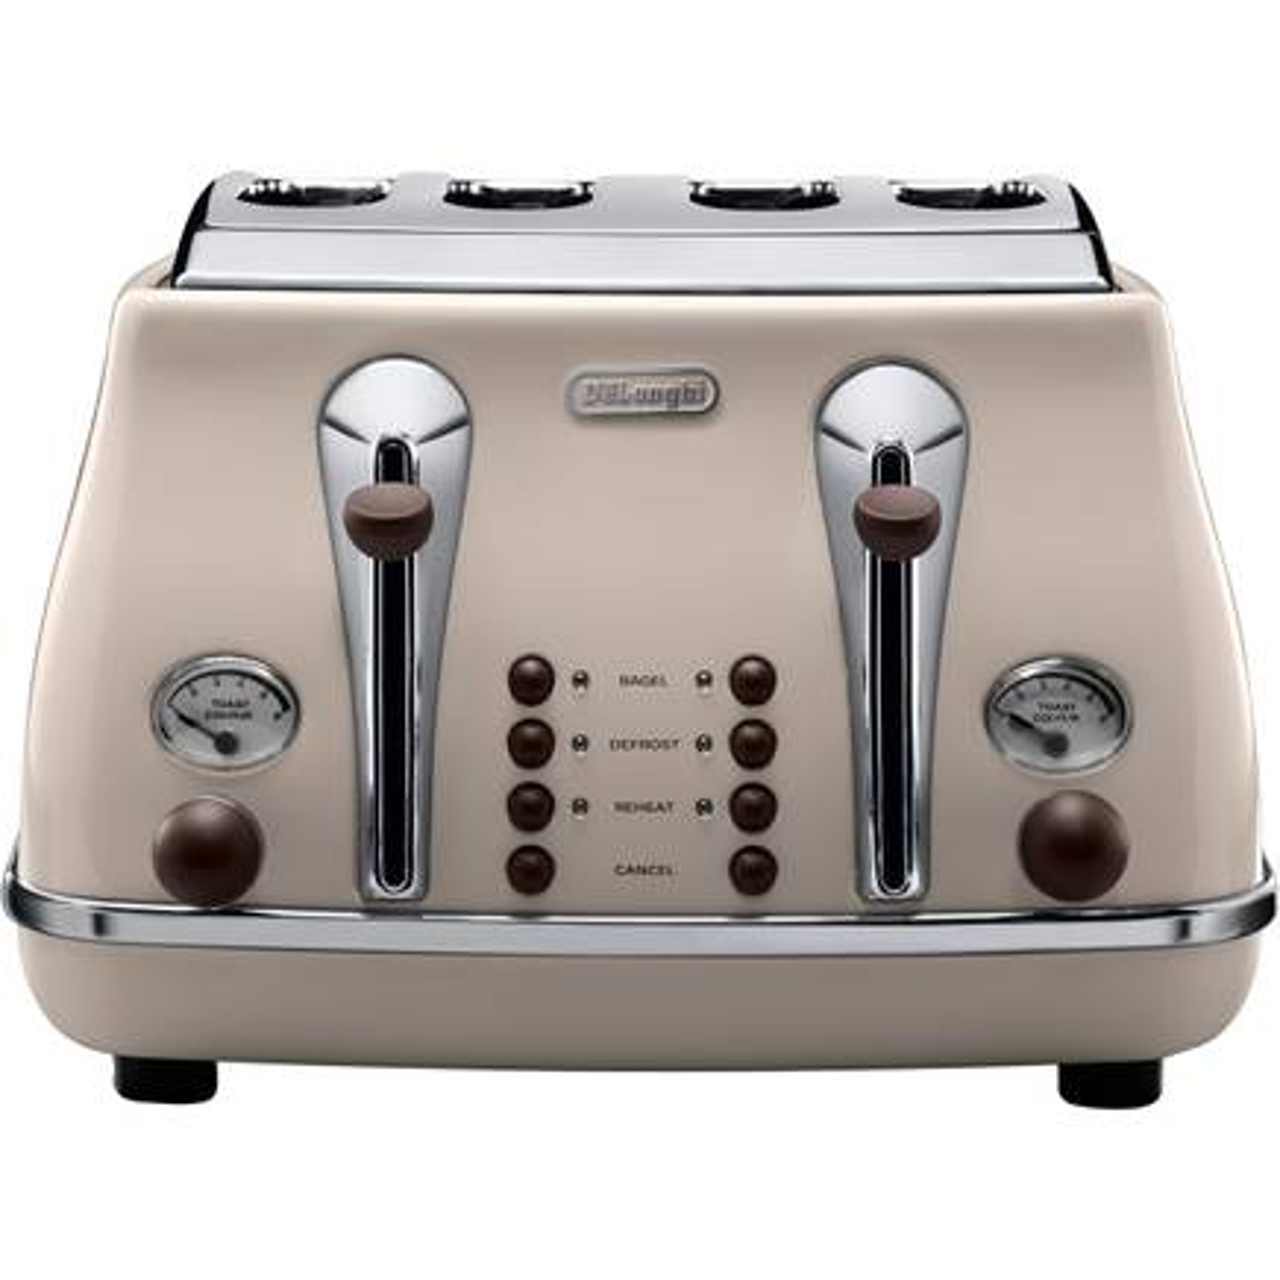 toaster-comparison_table-m-3